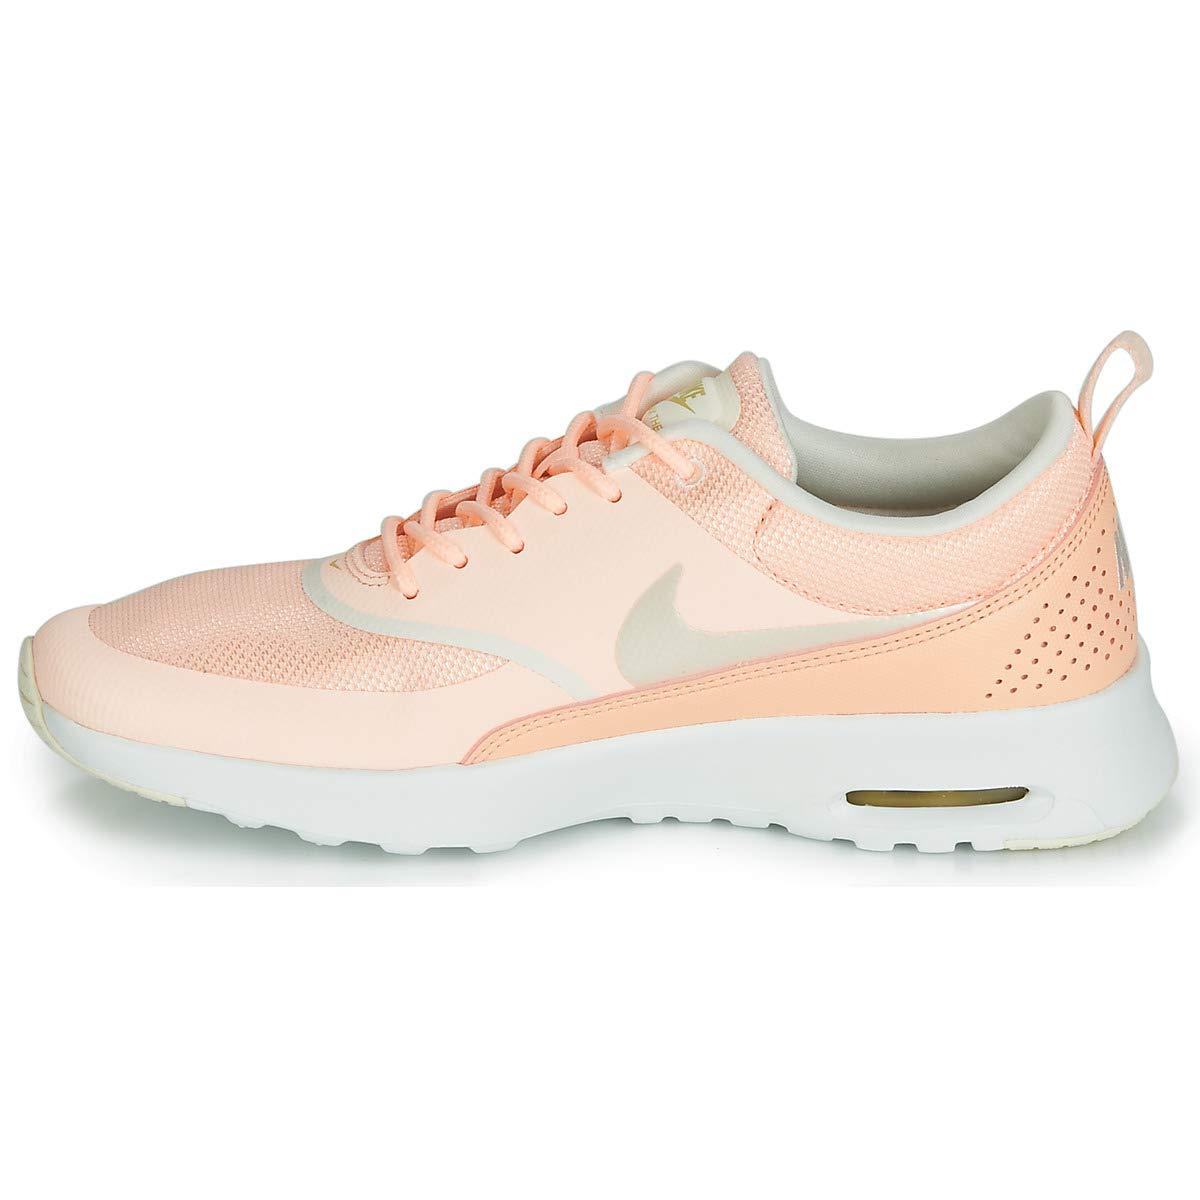 Nike Damen WMNS WMNS WMNS Air Max Thea Fitnessschuhe 5e4c94